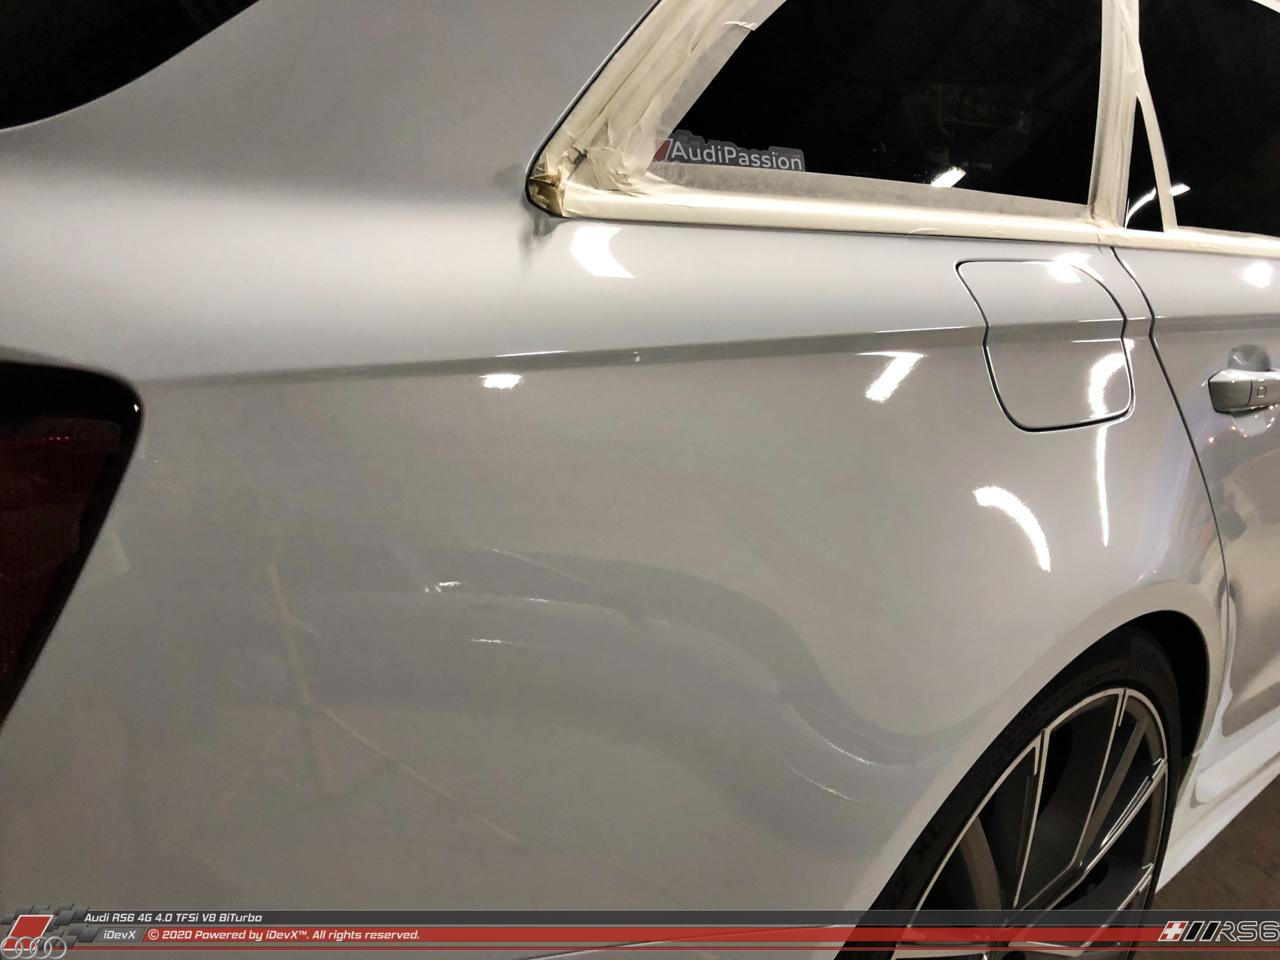 05_08.2019_Audi-RS6_iDevX_035b.png